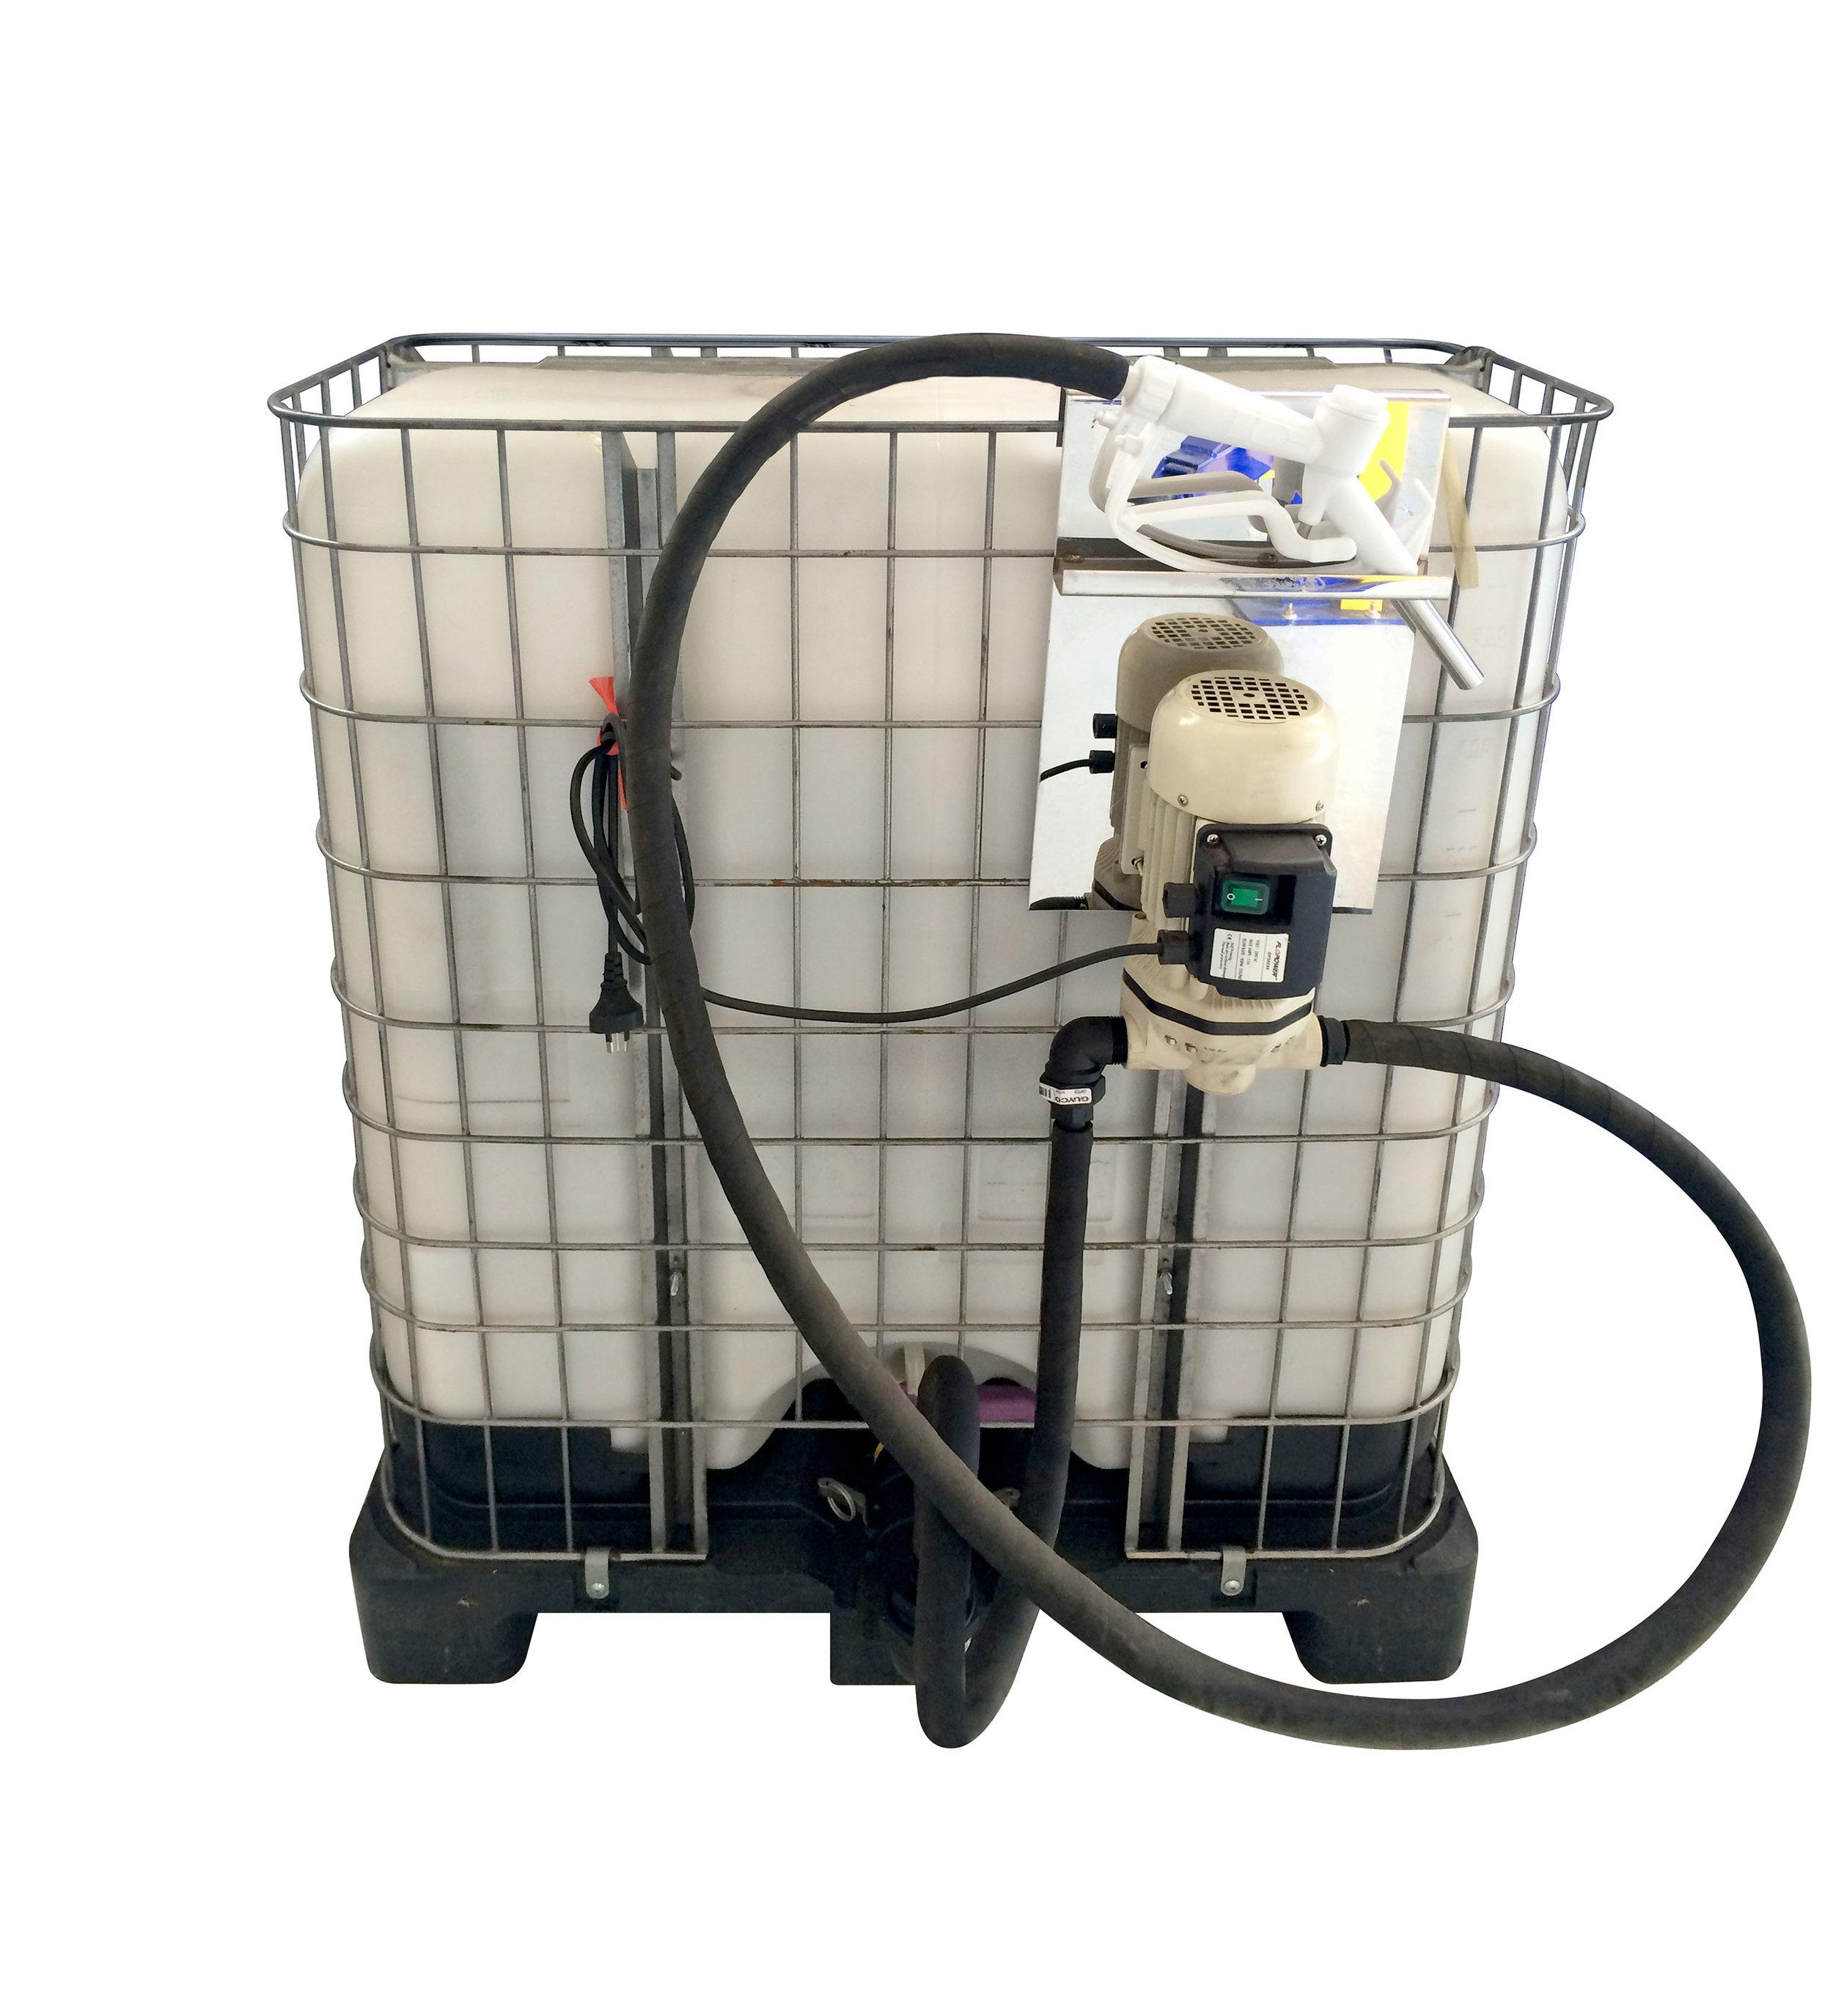 TECADBLUE.240M - Tecalemit AdBlue IBC Kit